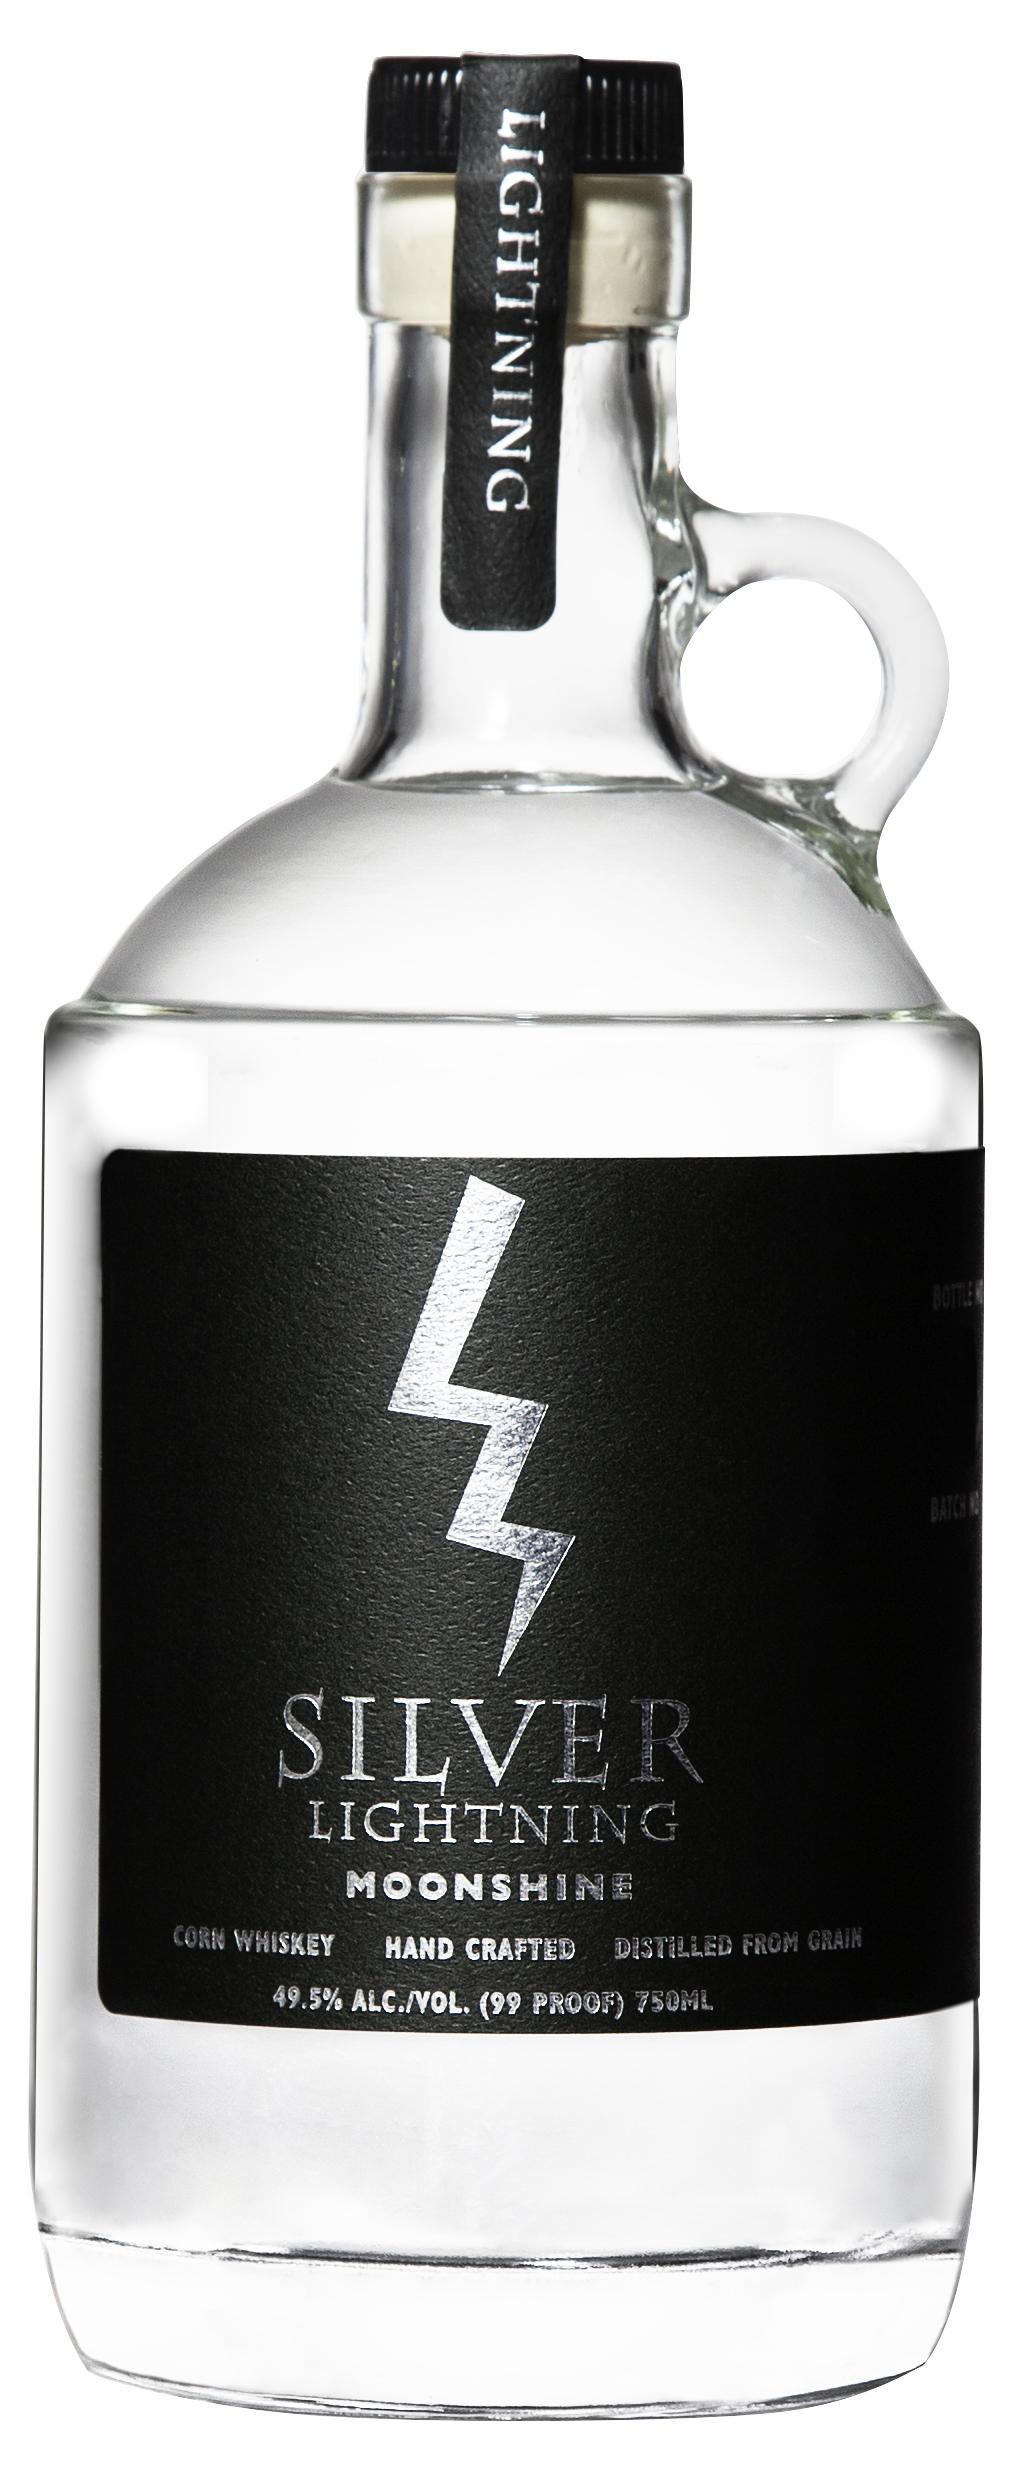 SilverLightningMoonshine.jpg